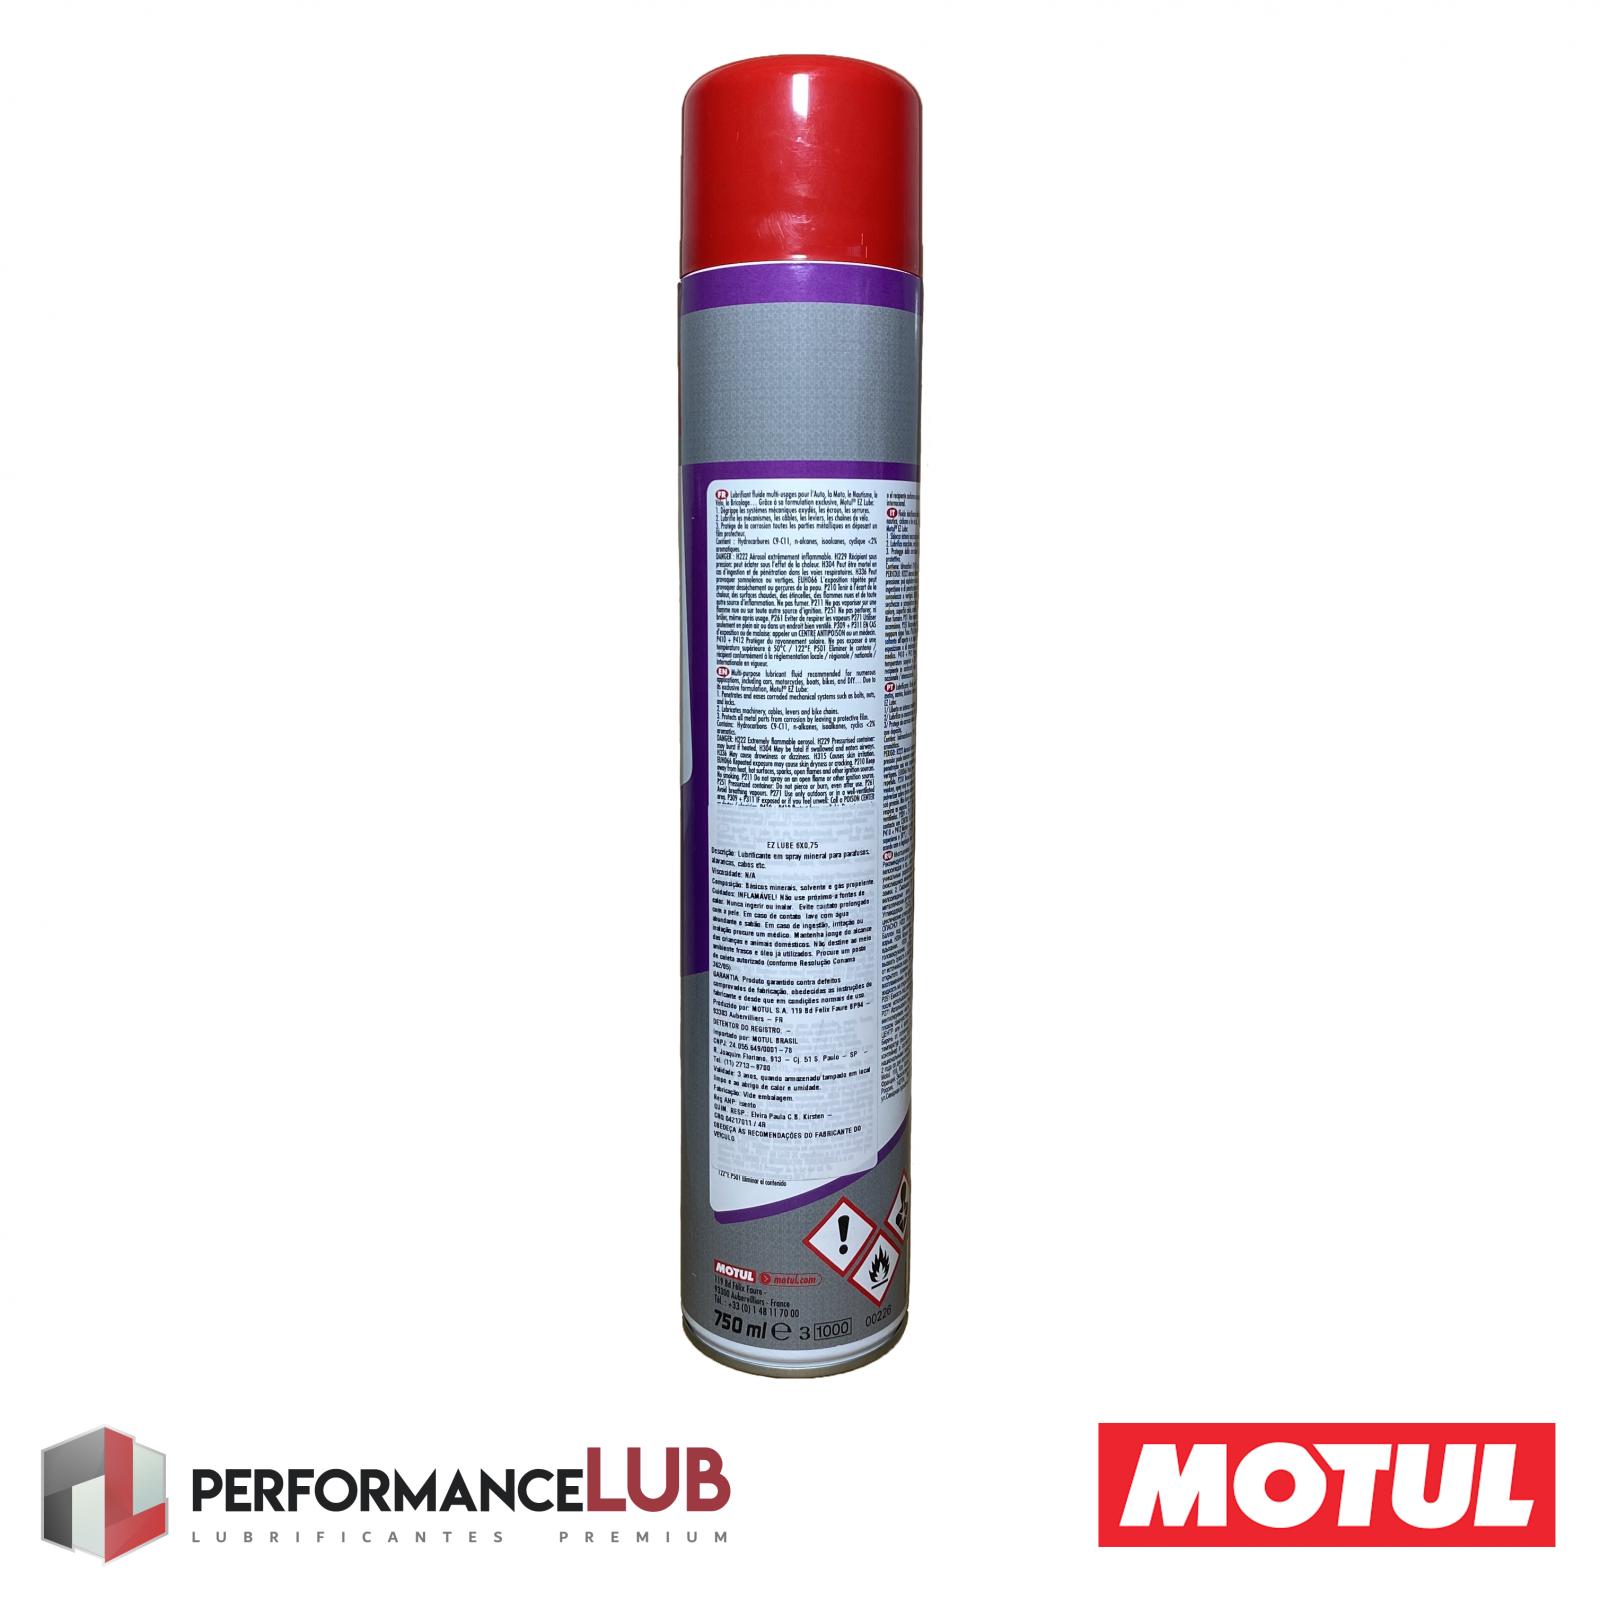 EZ Lube - 750 ml - PerformanceLUB Lubrificantes Premium